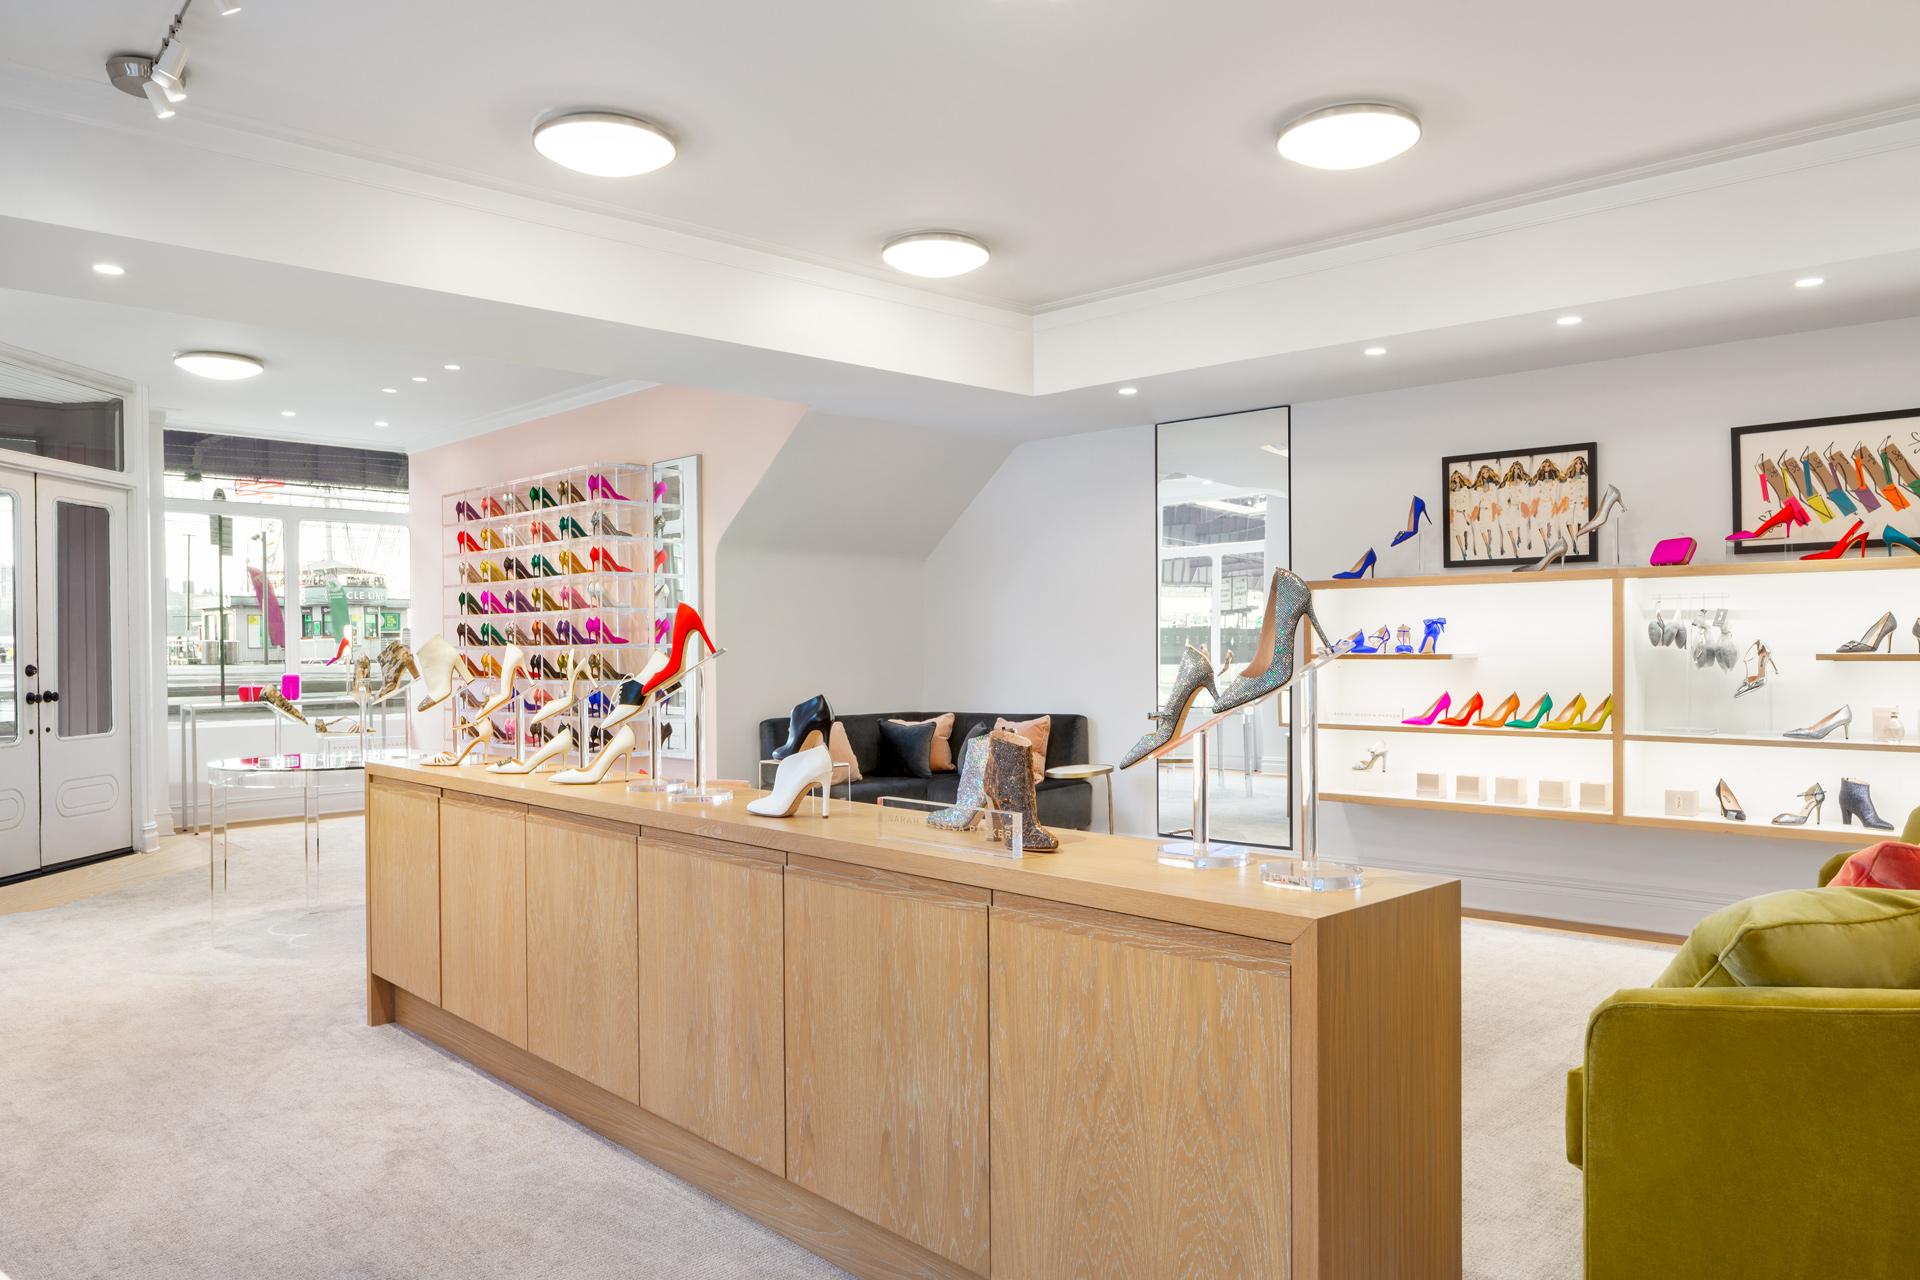 SJP by Sarah Jessica Parker retails store design ideas